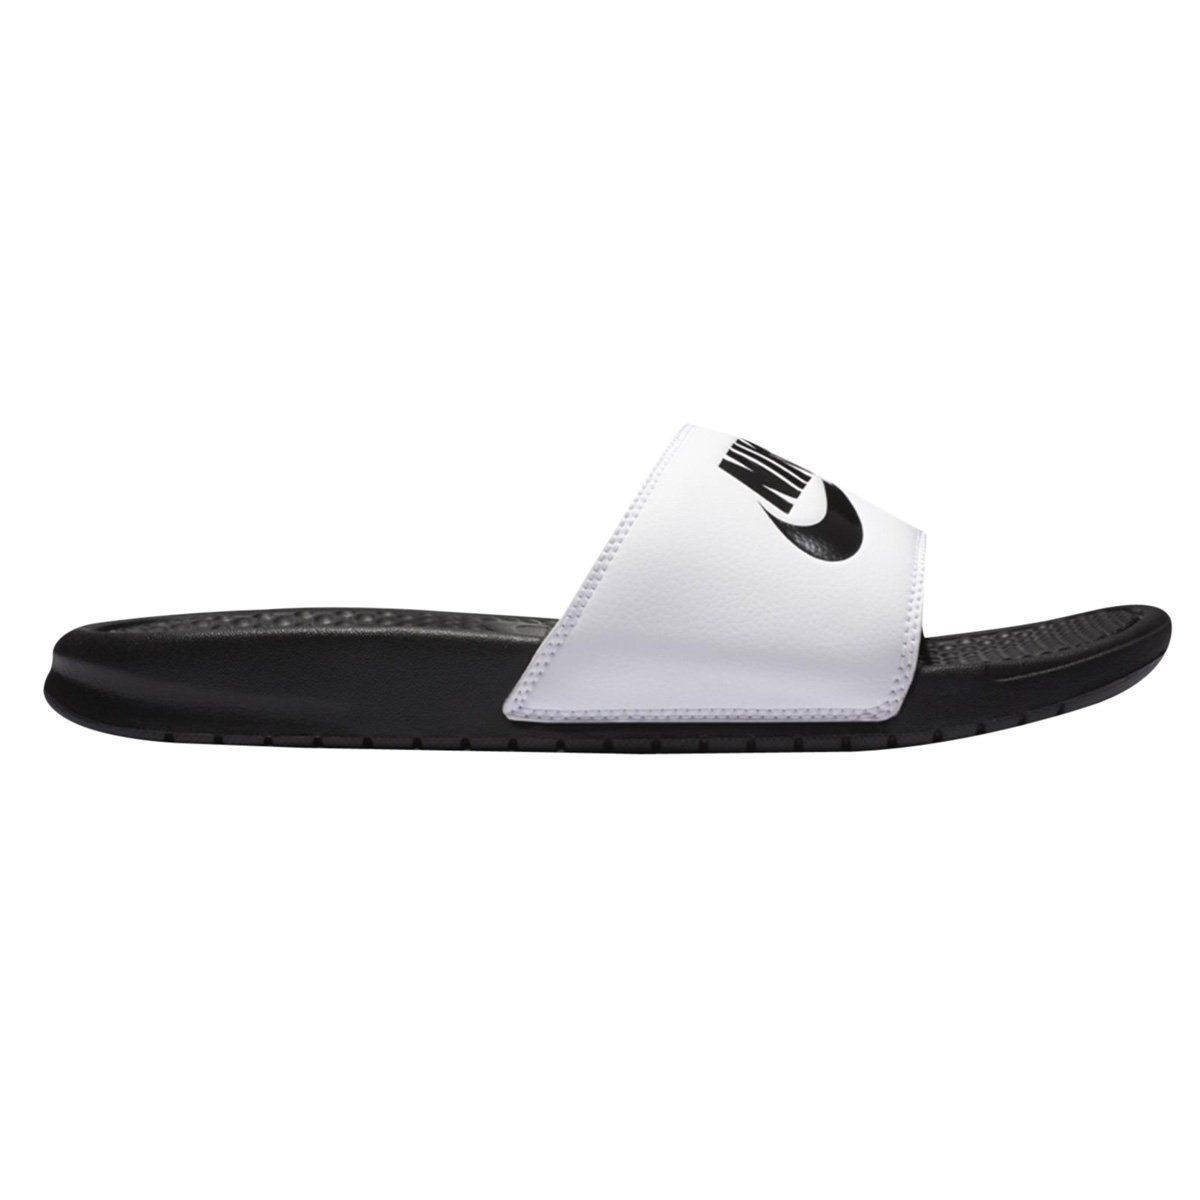 Chinelo Sandália Nike Benassi - Preto / Branco